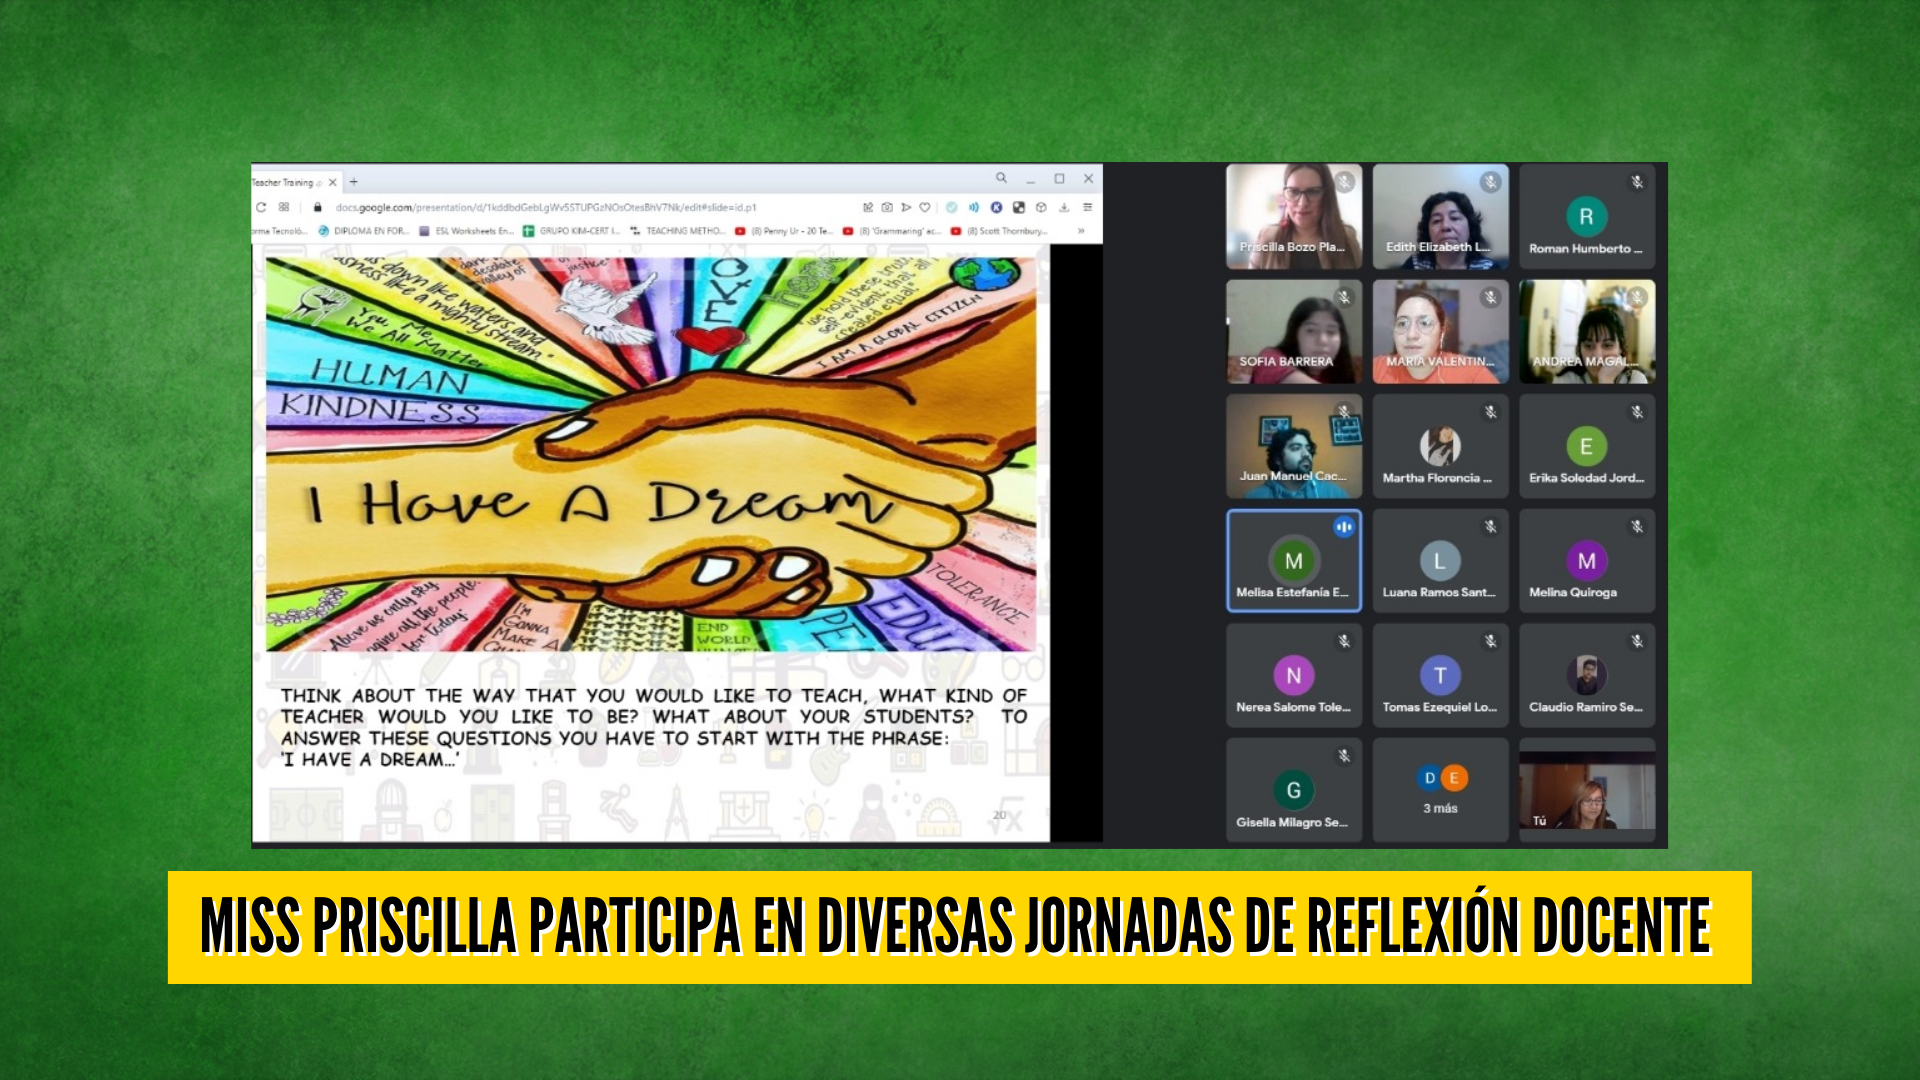 MISS PRISCILLA PARTICIPA EN DIVERSAS JORNADAS DE REFLEXIÓN DOCENTE